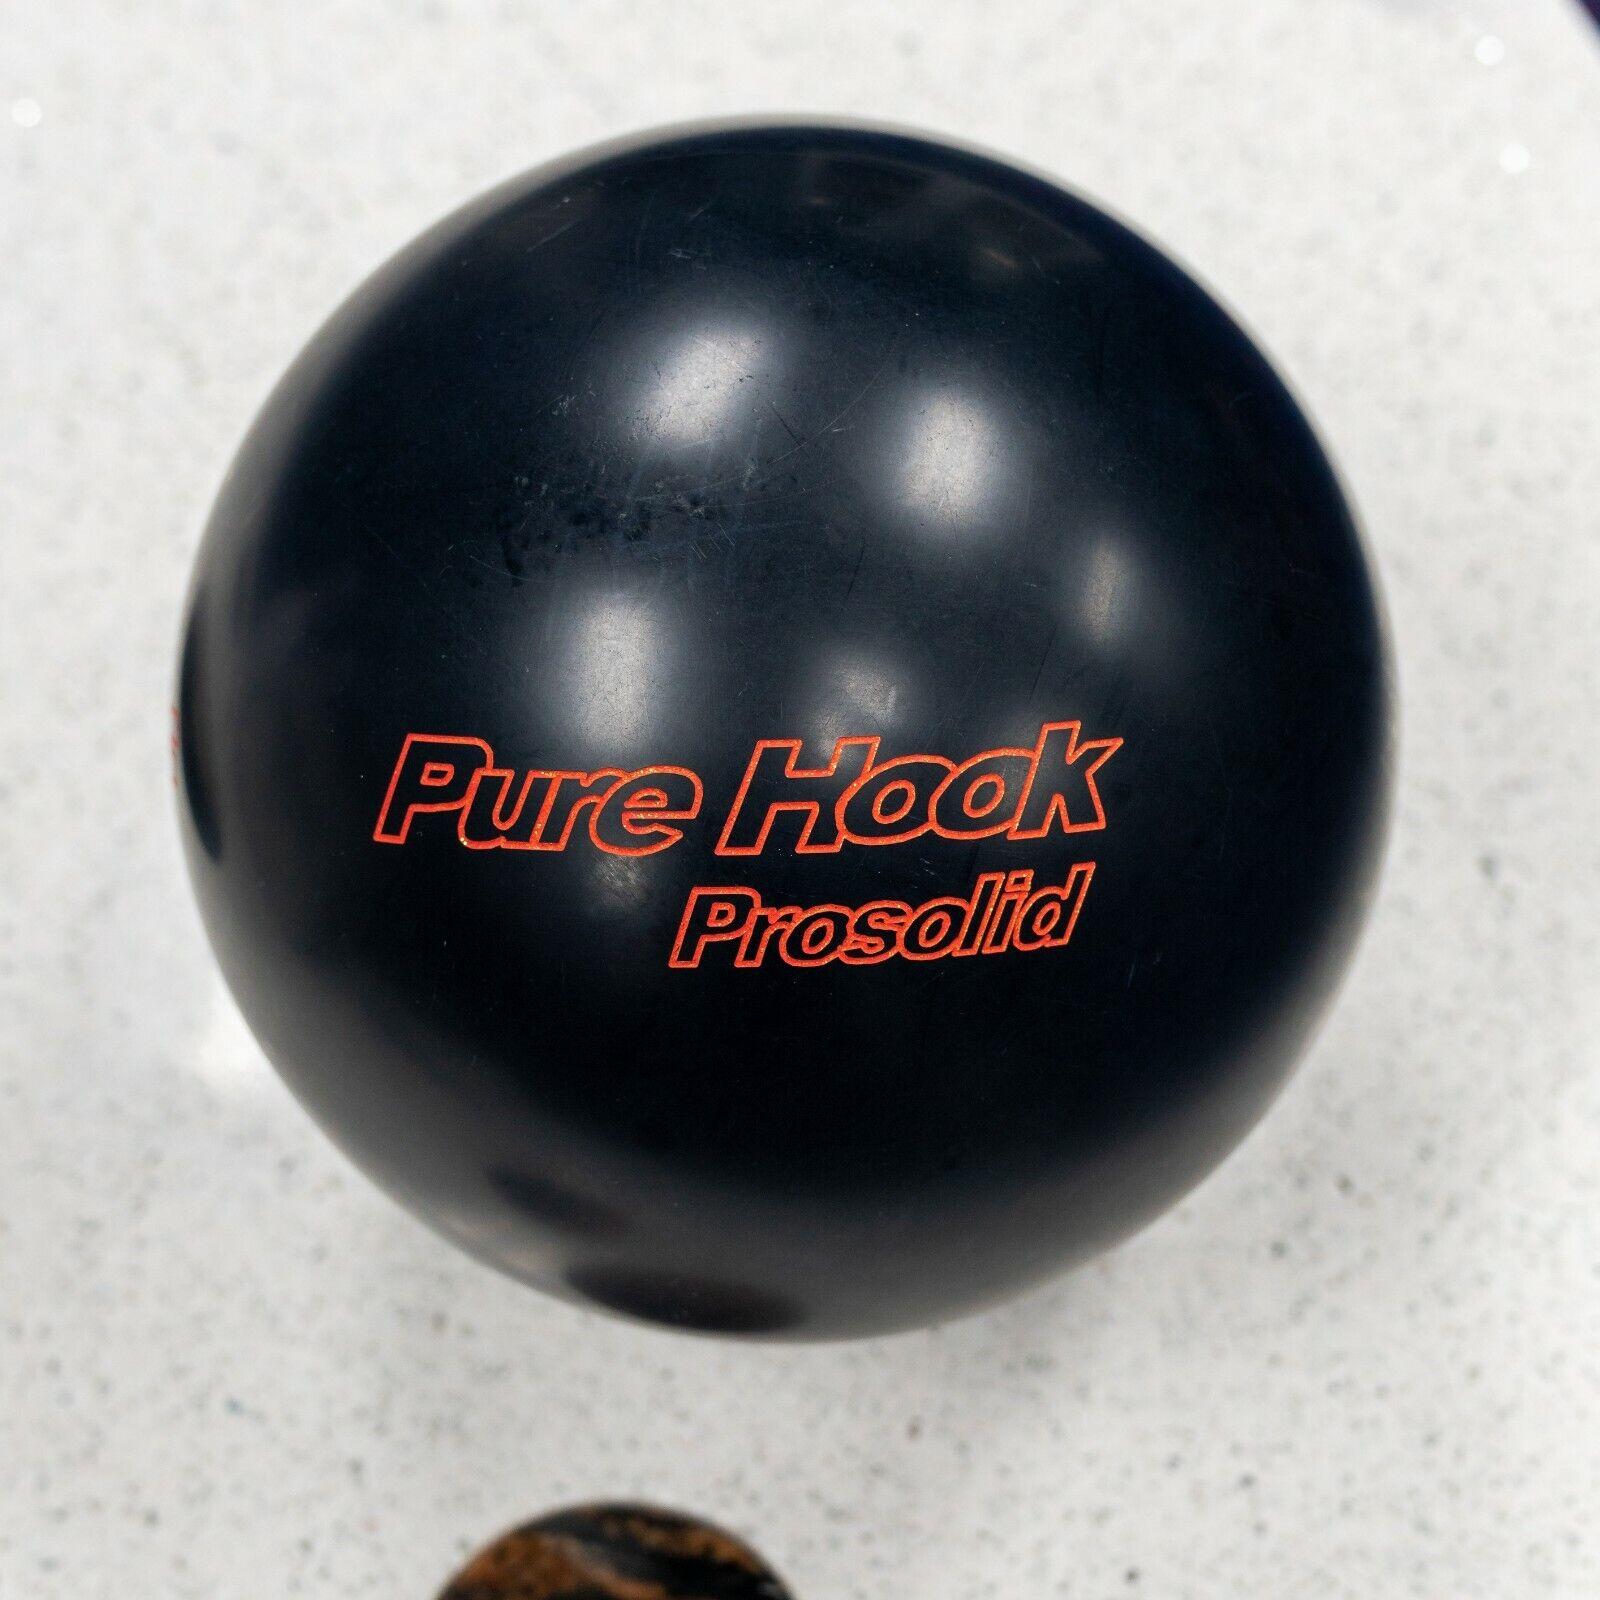 NIB - AMF Triumph Pure Hook Prosolid Bowling Ball - 16 LB - Overseas Release